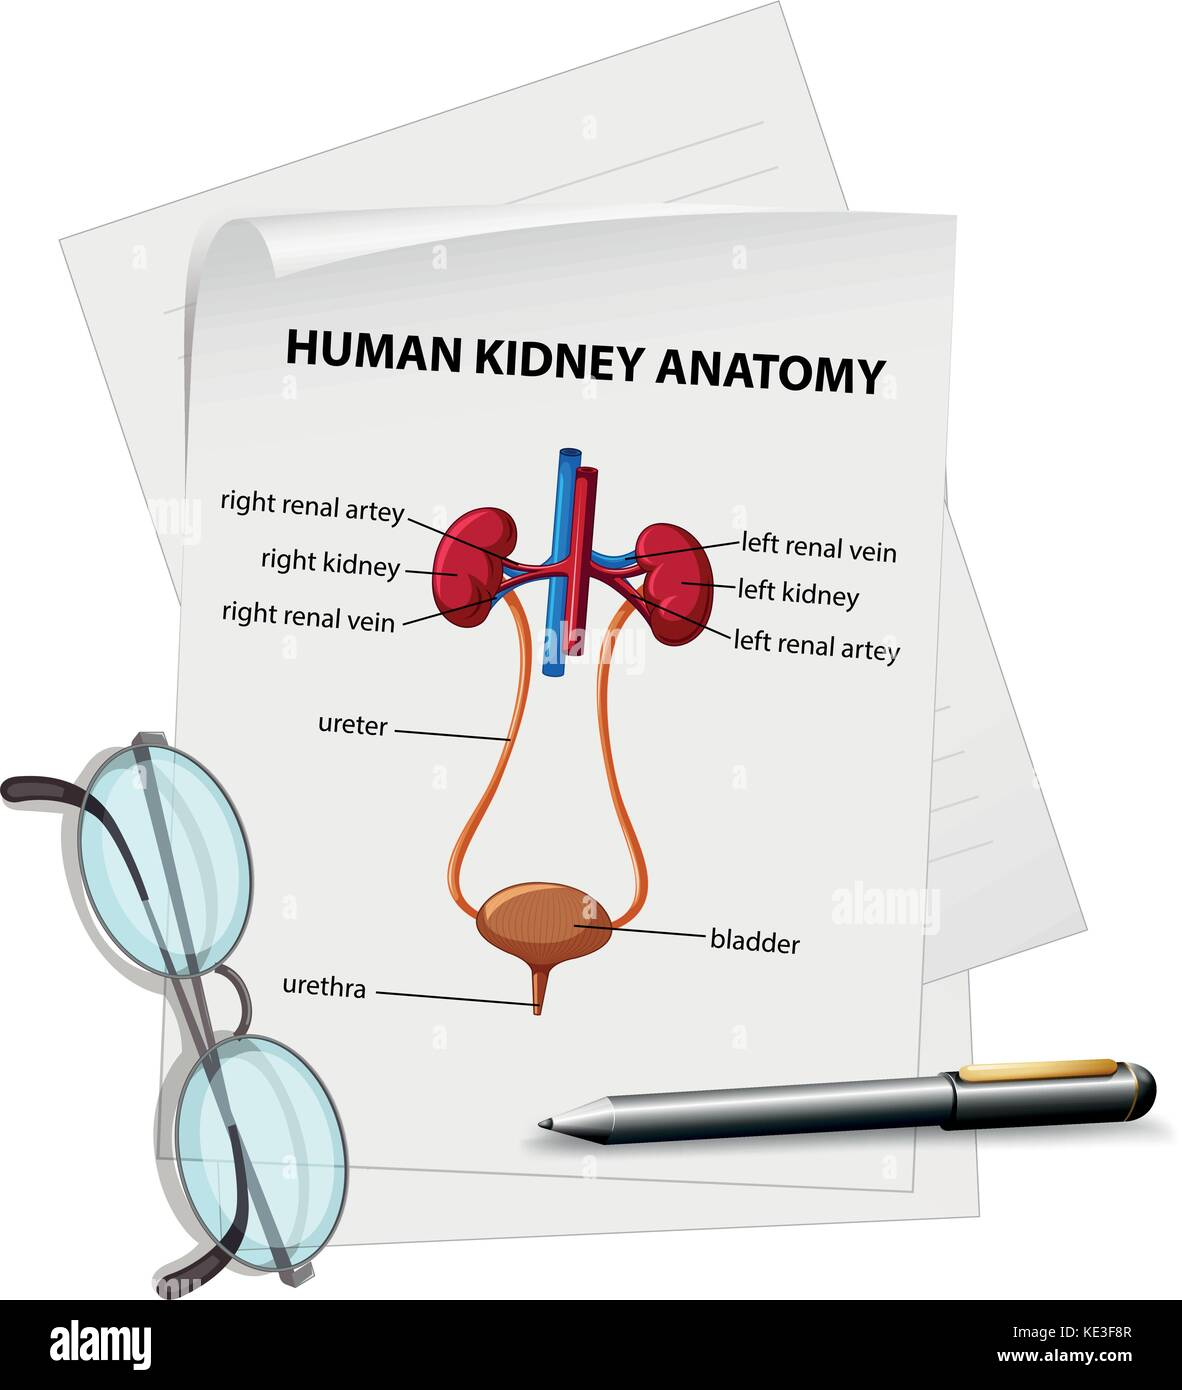 Right Kidney Anatomy Gallery Human Body Anatomy